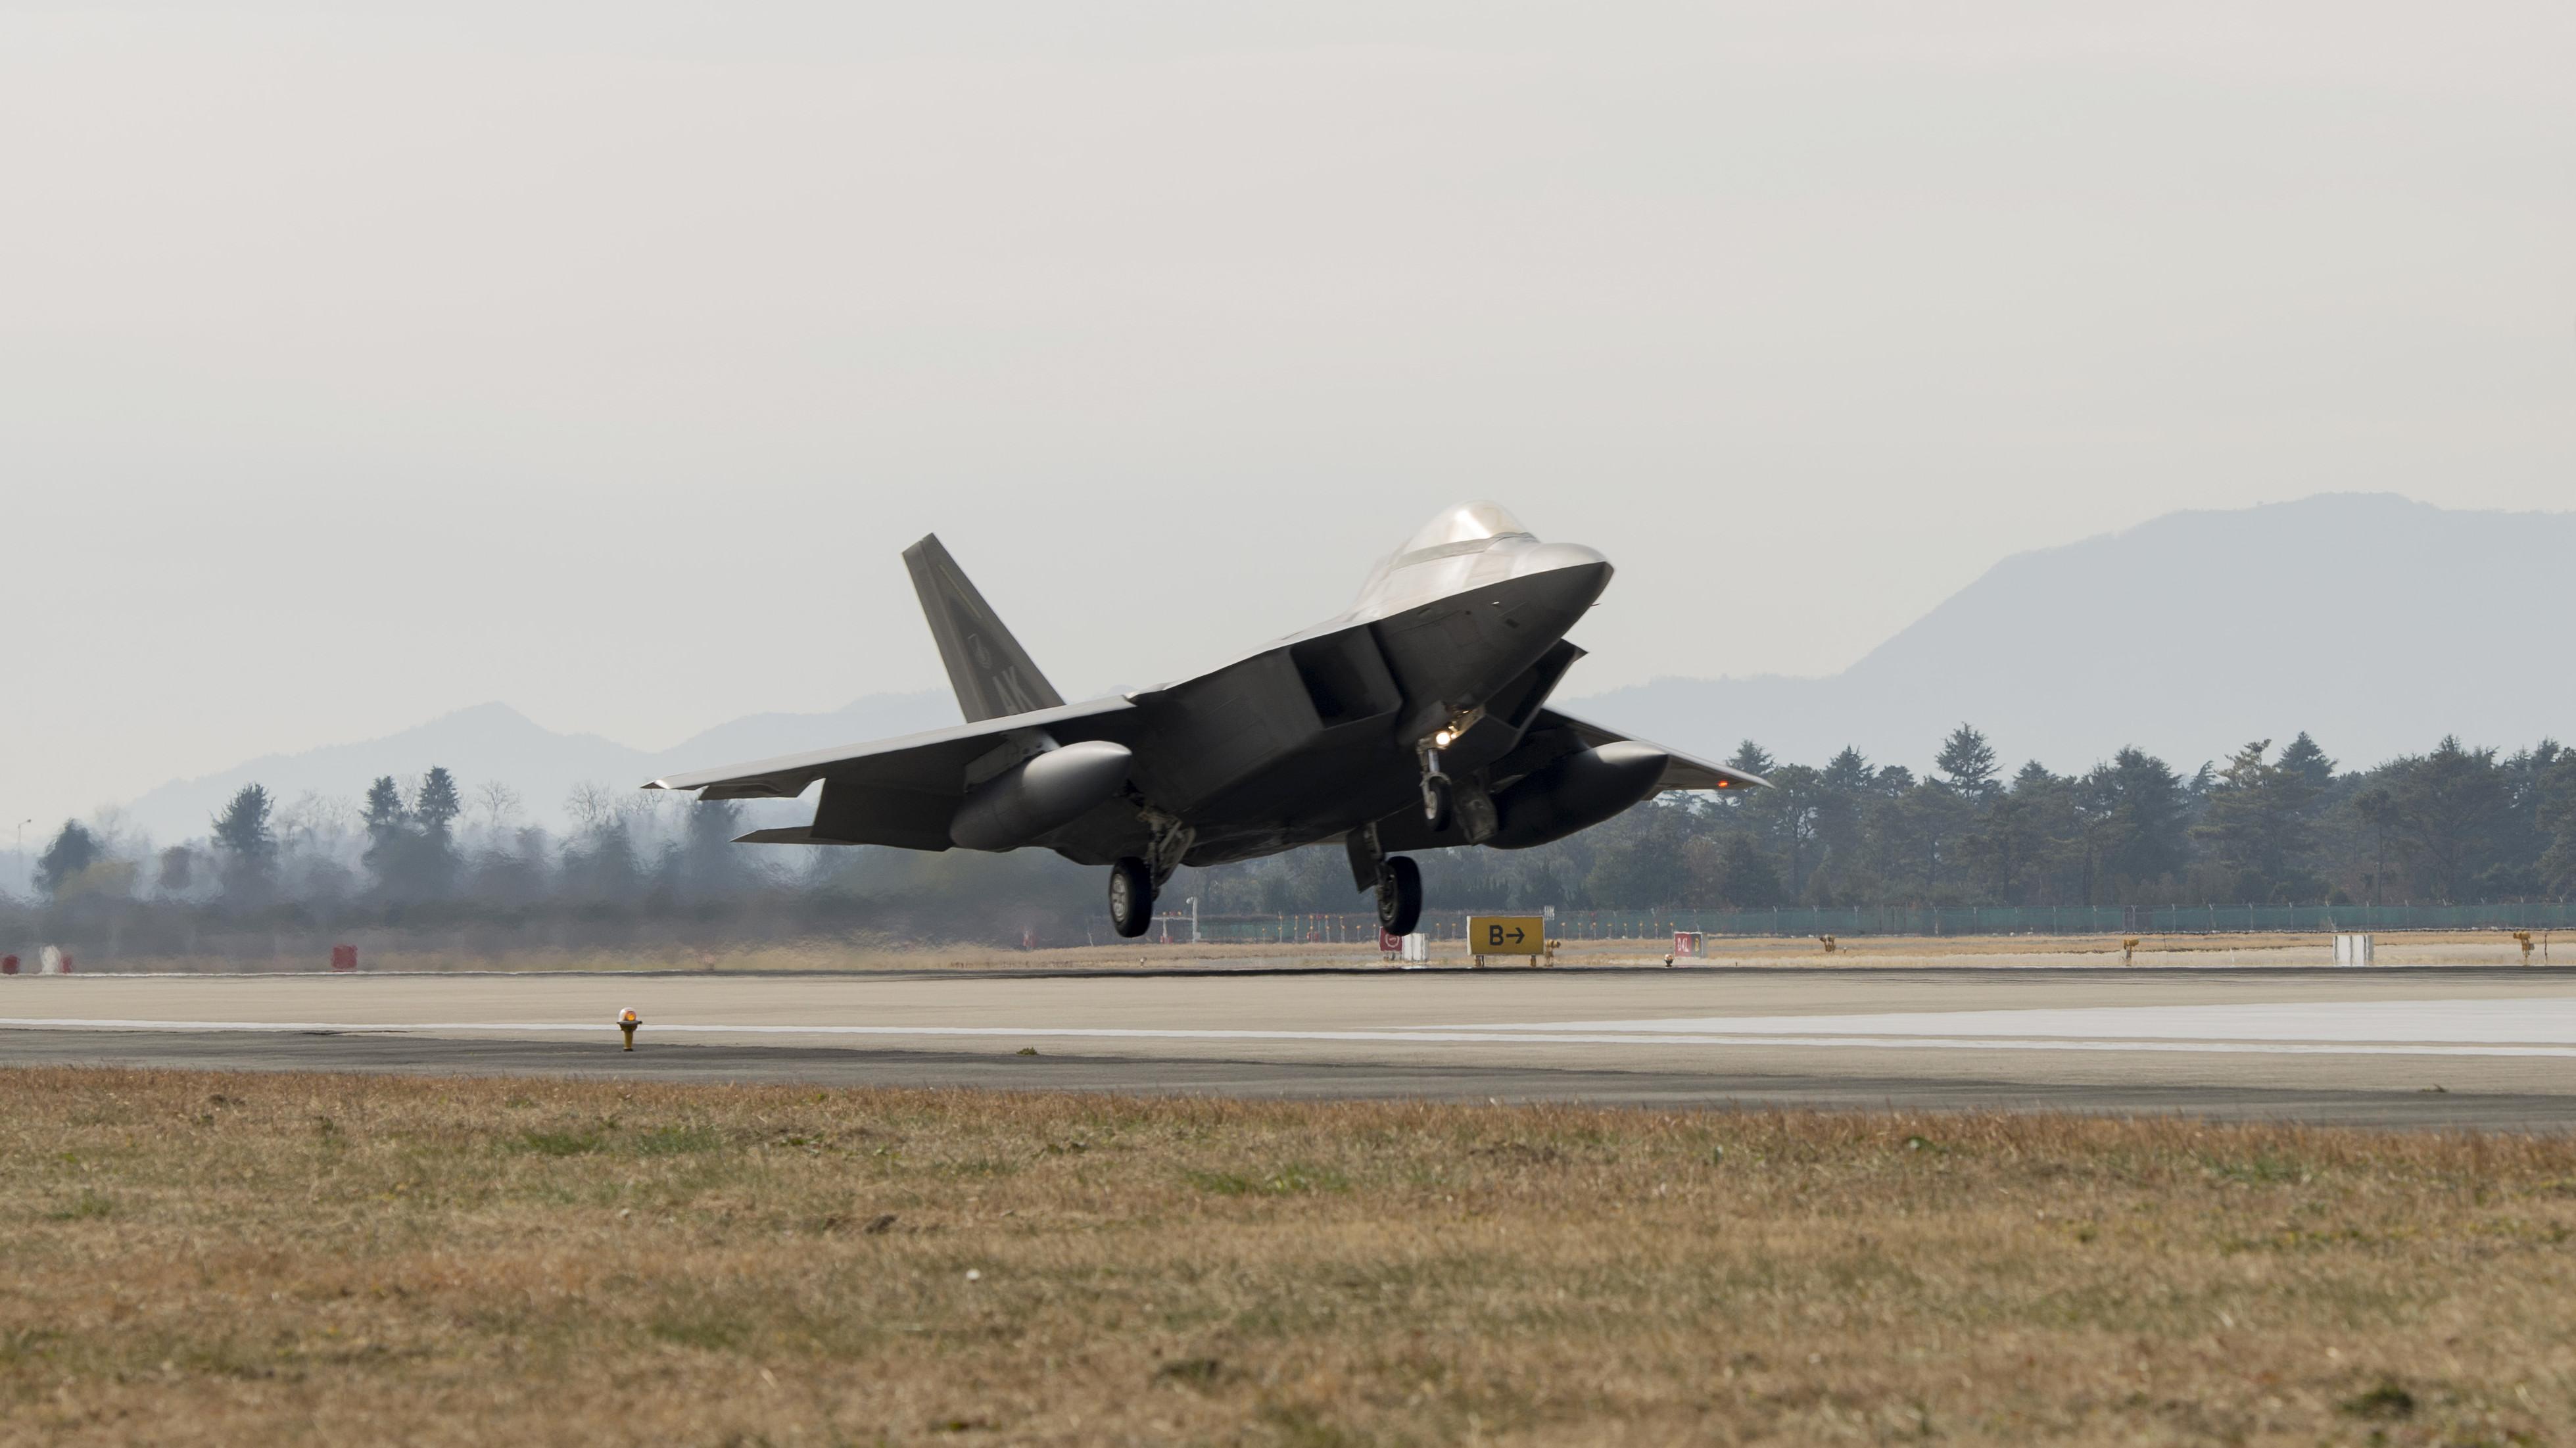 <p><span>Фото &copy; Senior Airman Jessica Smith/U.S. Air Force photo via AP</span></p>